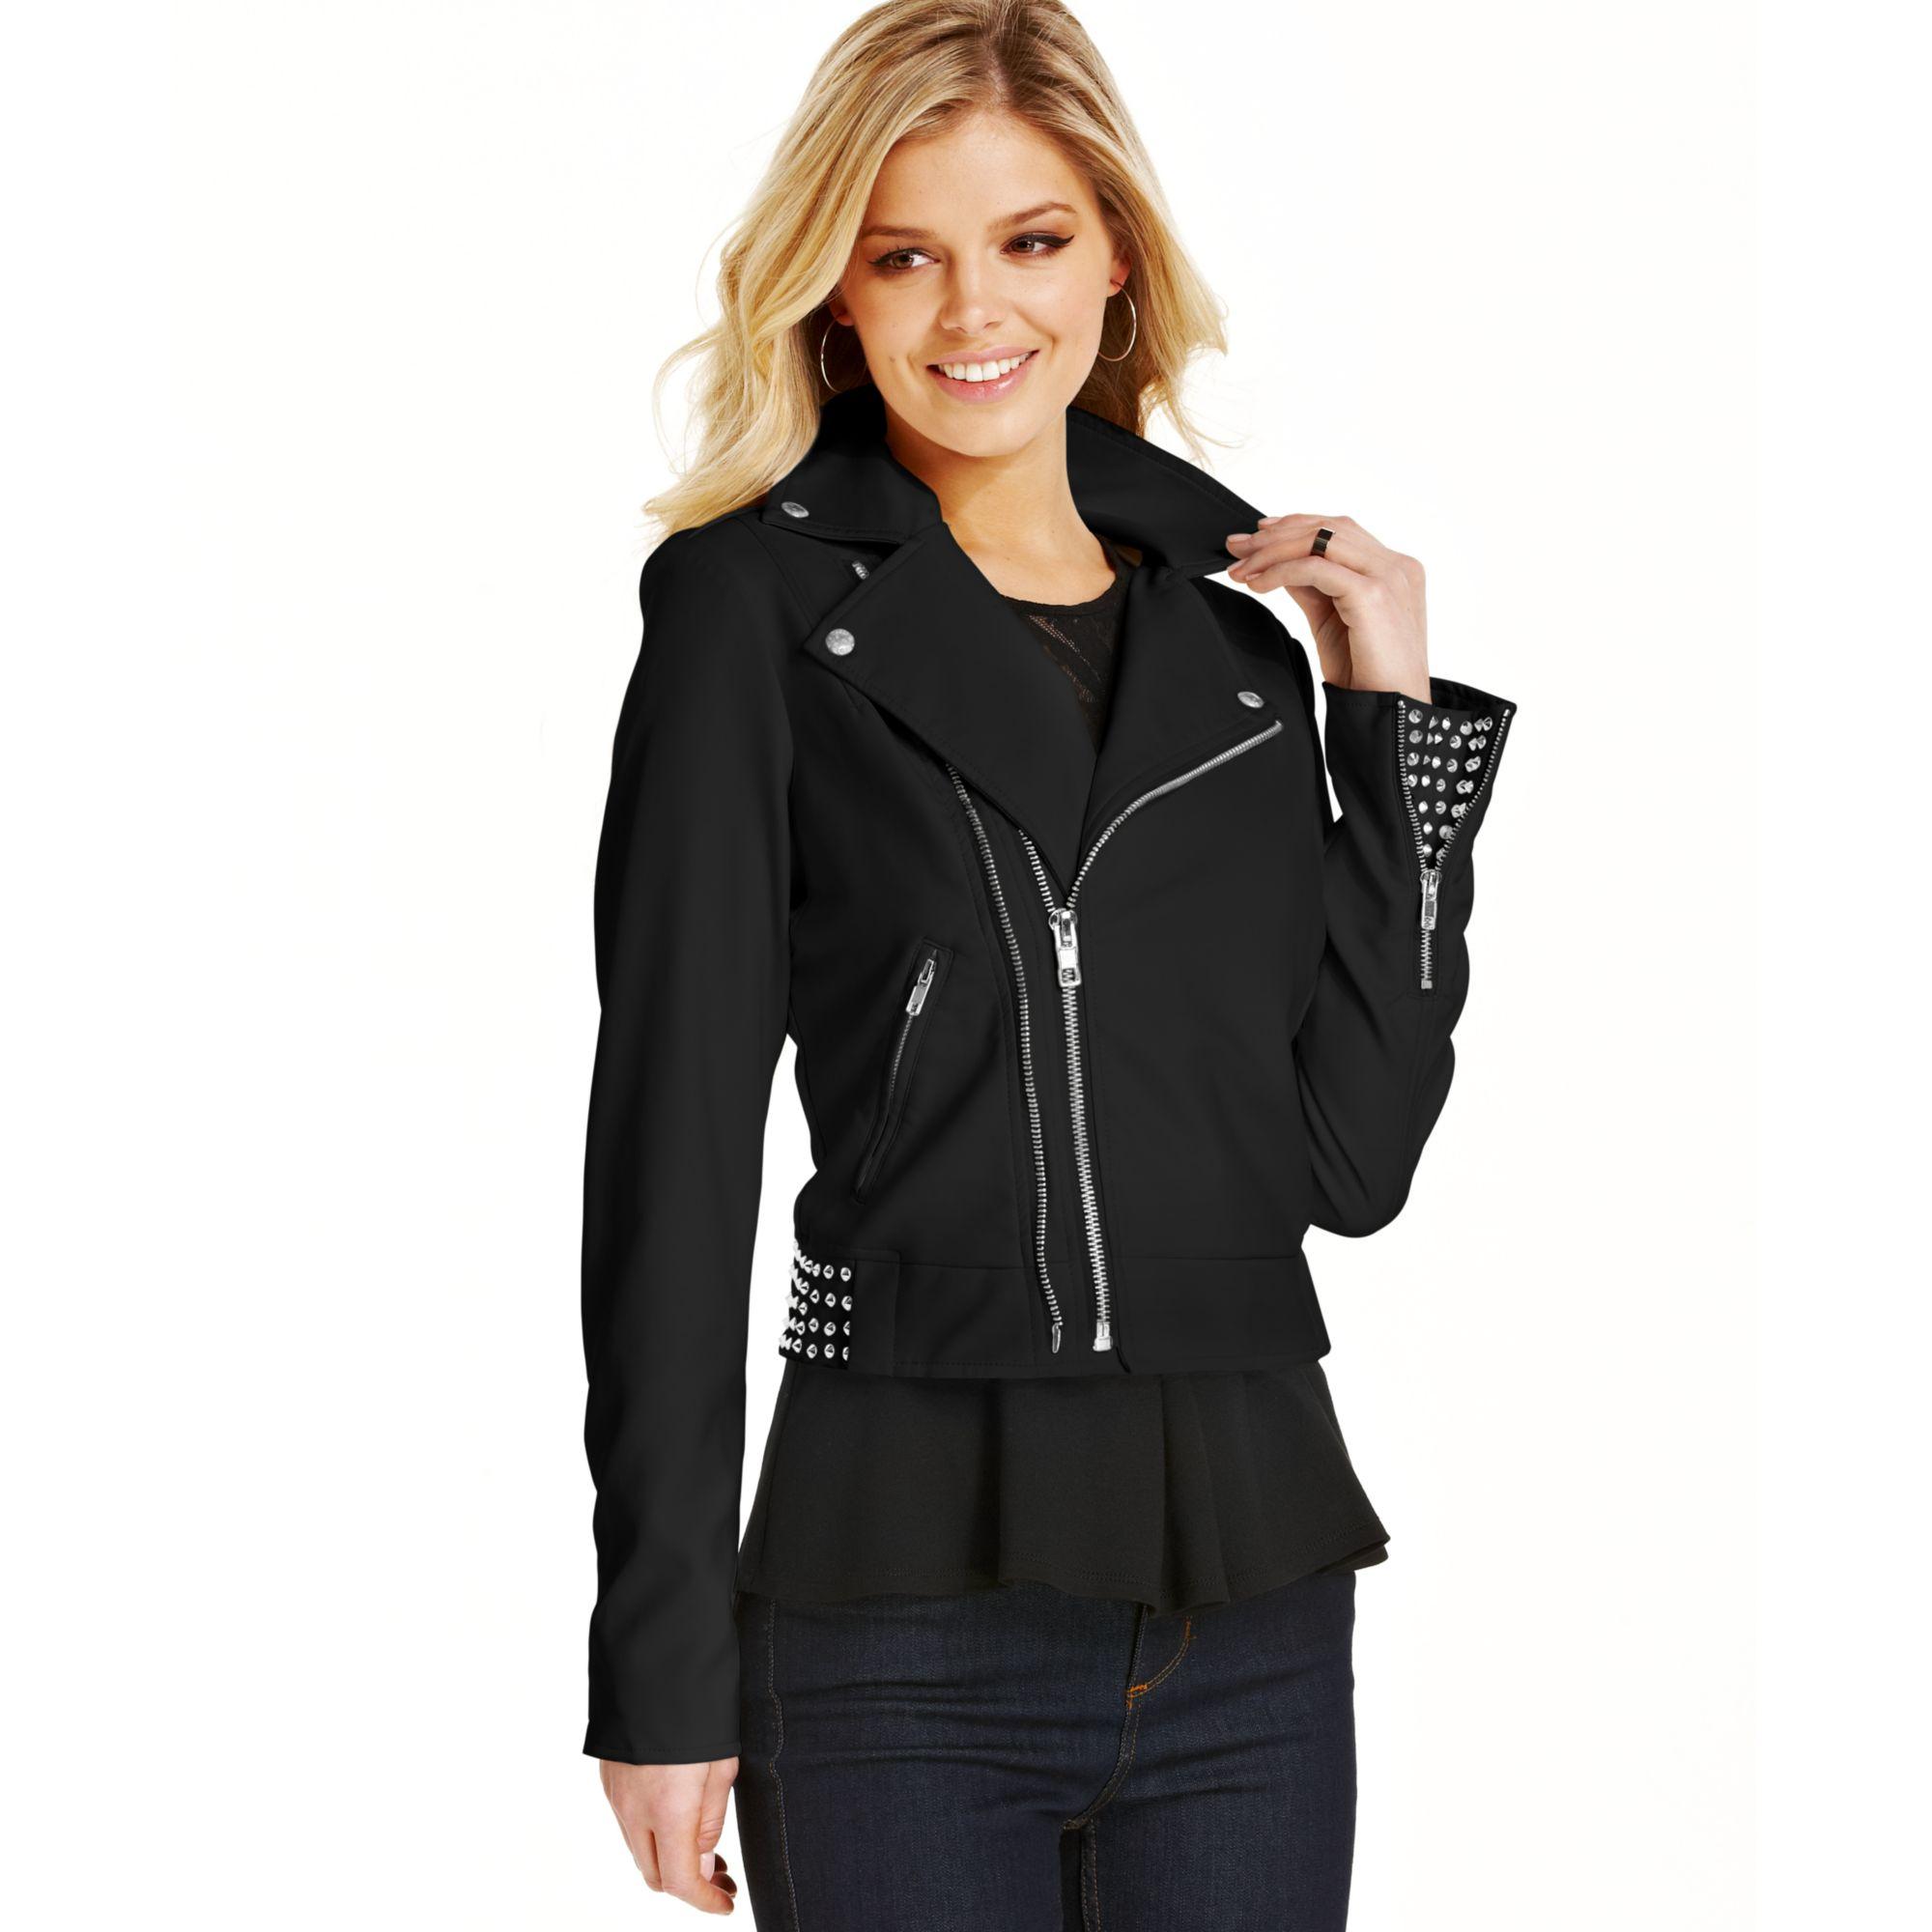 Wet Seal Jackets Coats Taupe Studded Faux Leather Moto Jacket